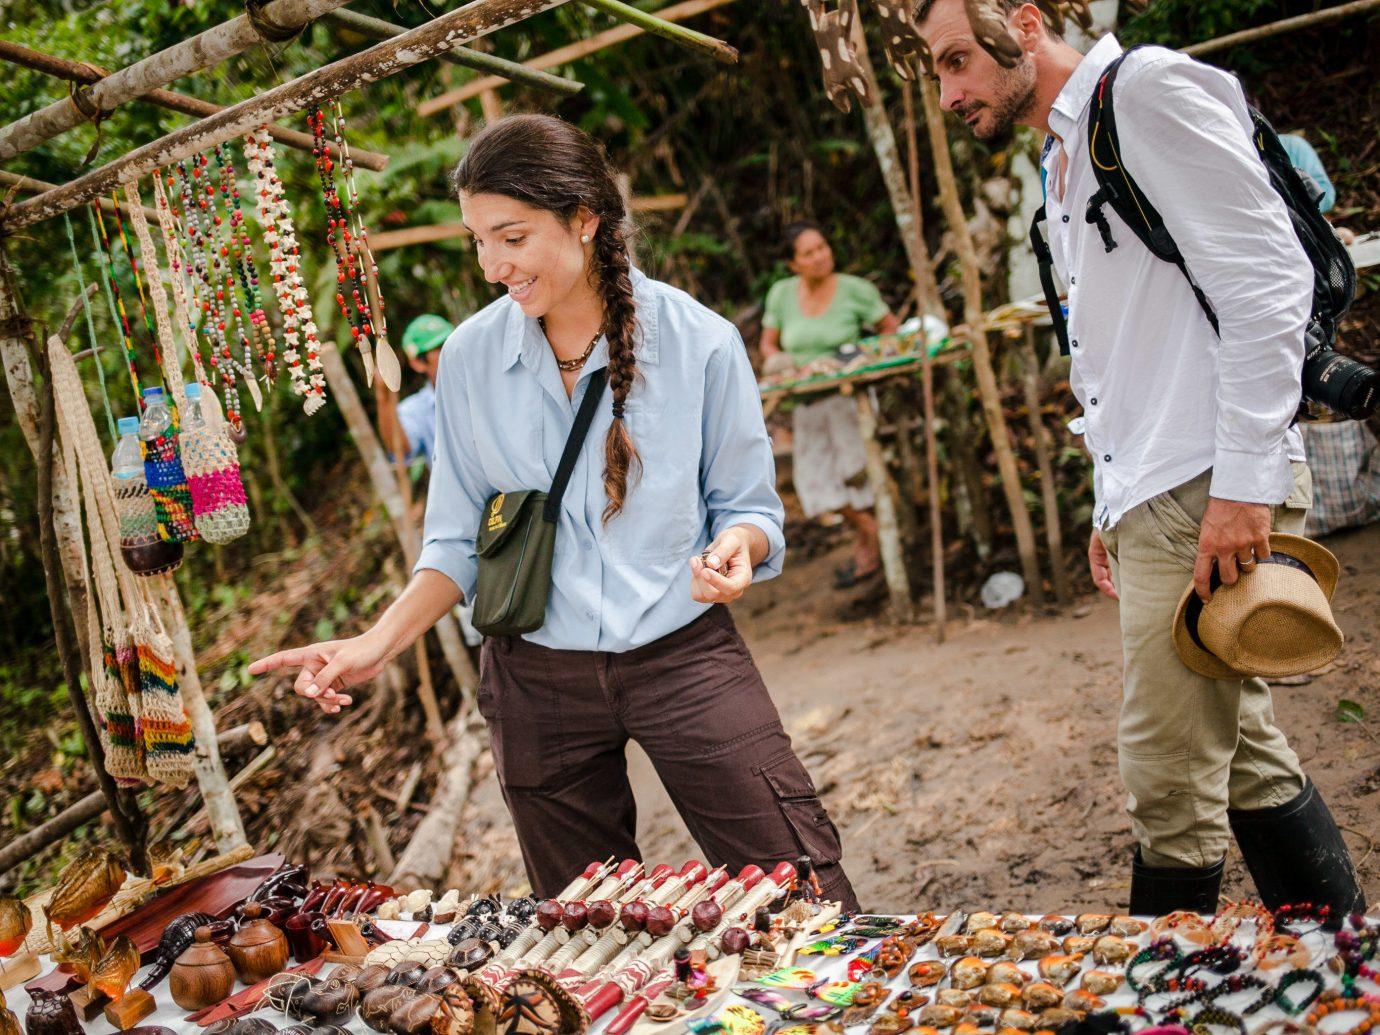 Travel Tips person outdoor marketplace tree plant recreation girl fun Garden